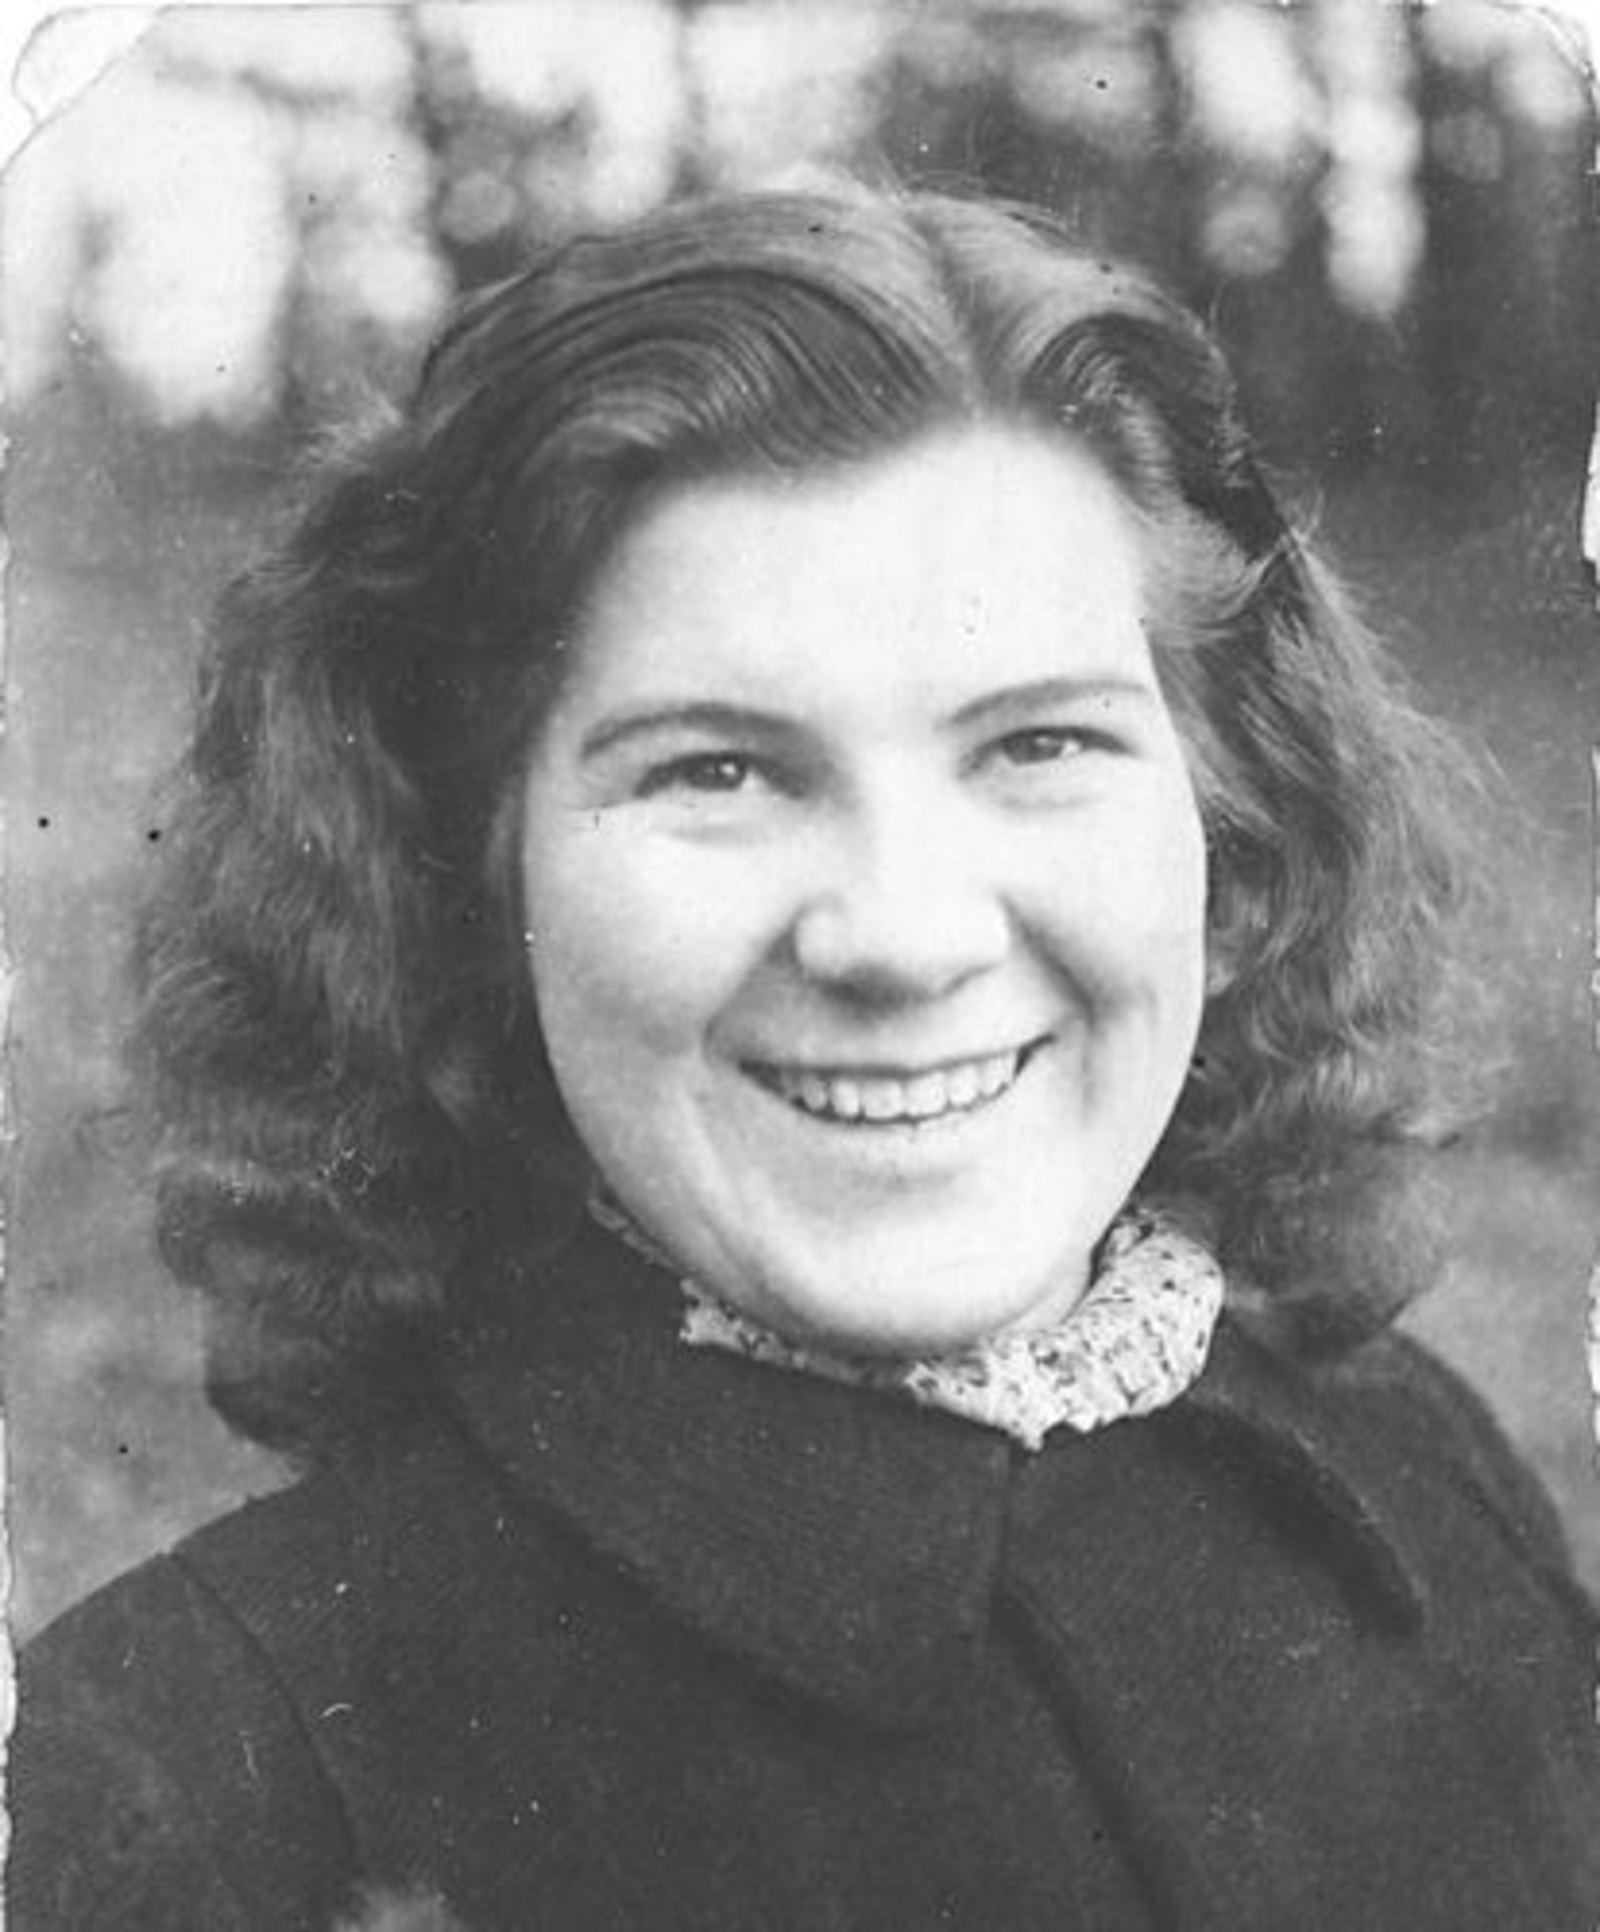 Bliek Jannie 1927 19__ Portret